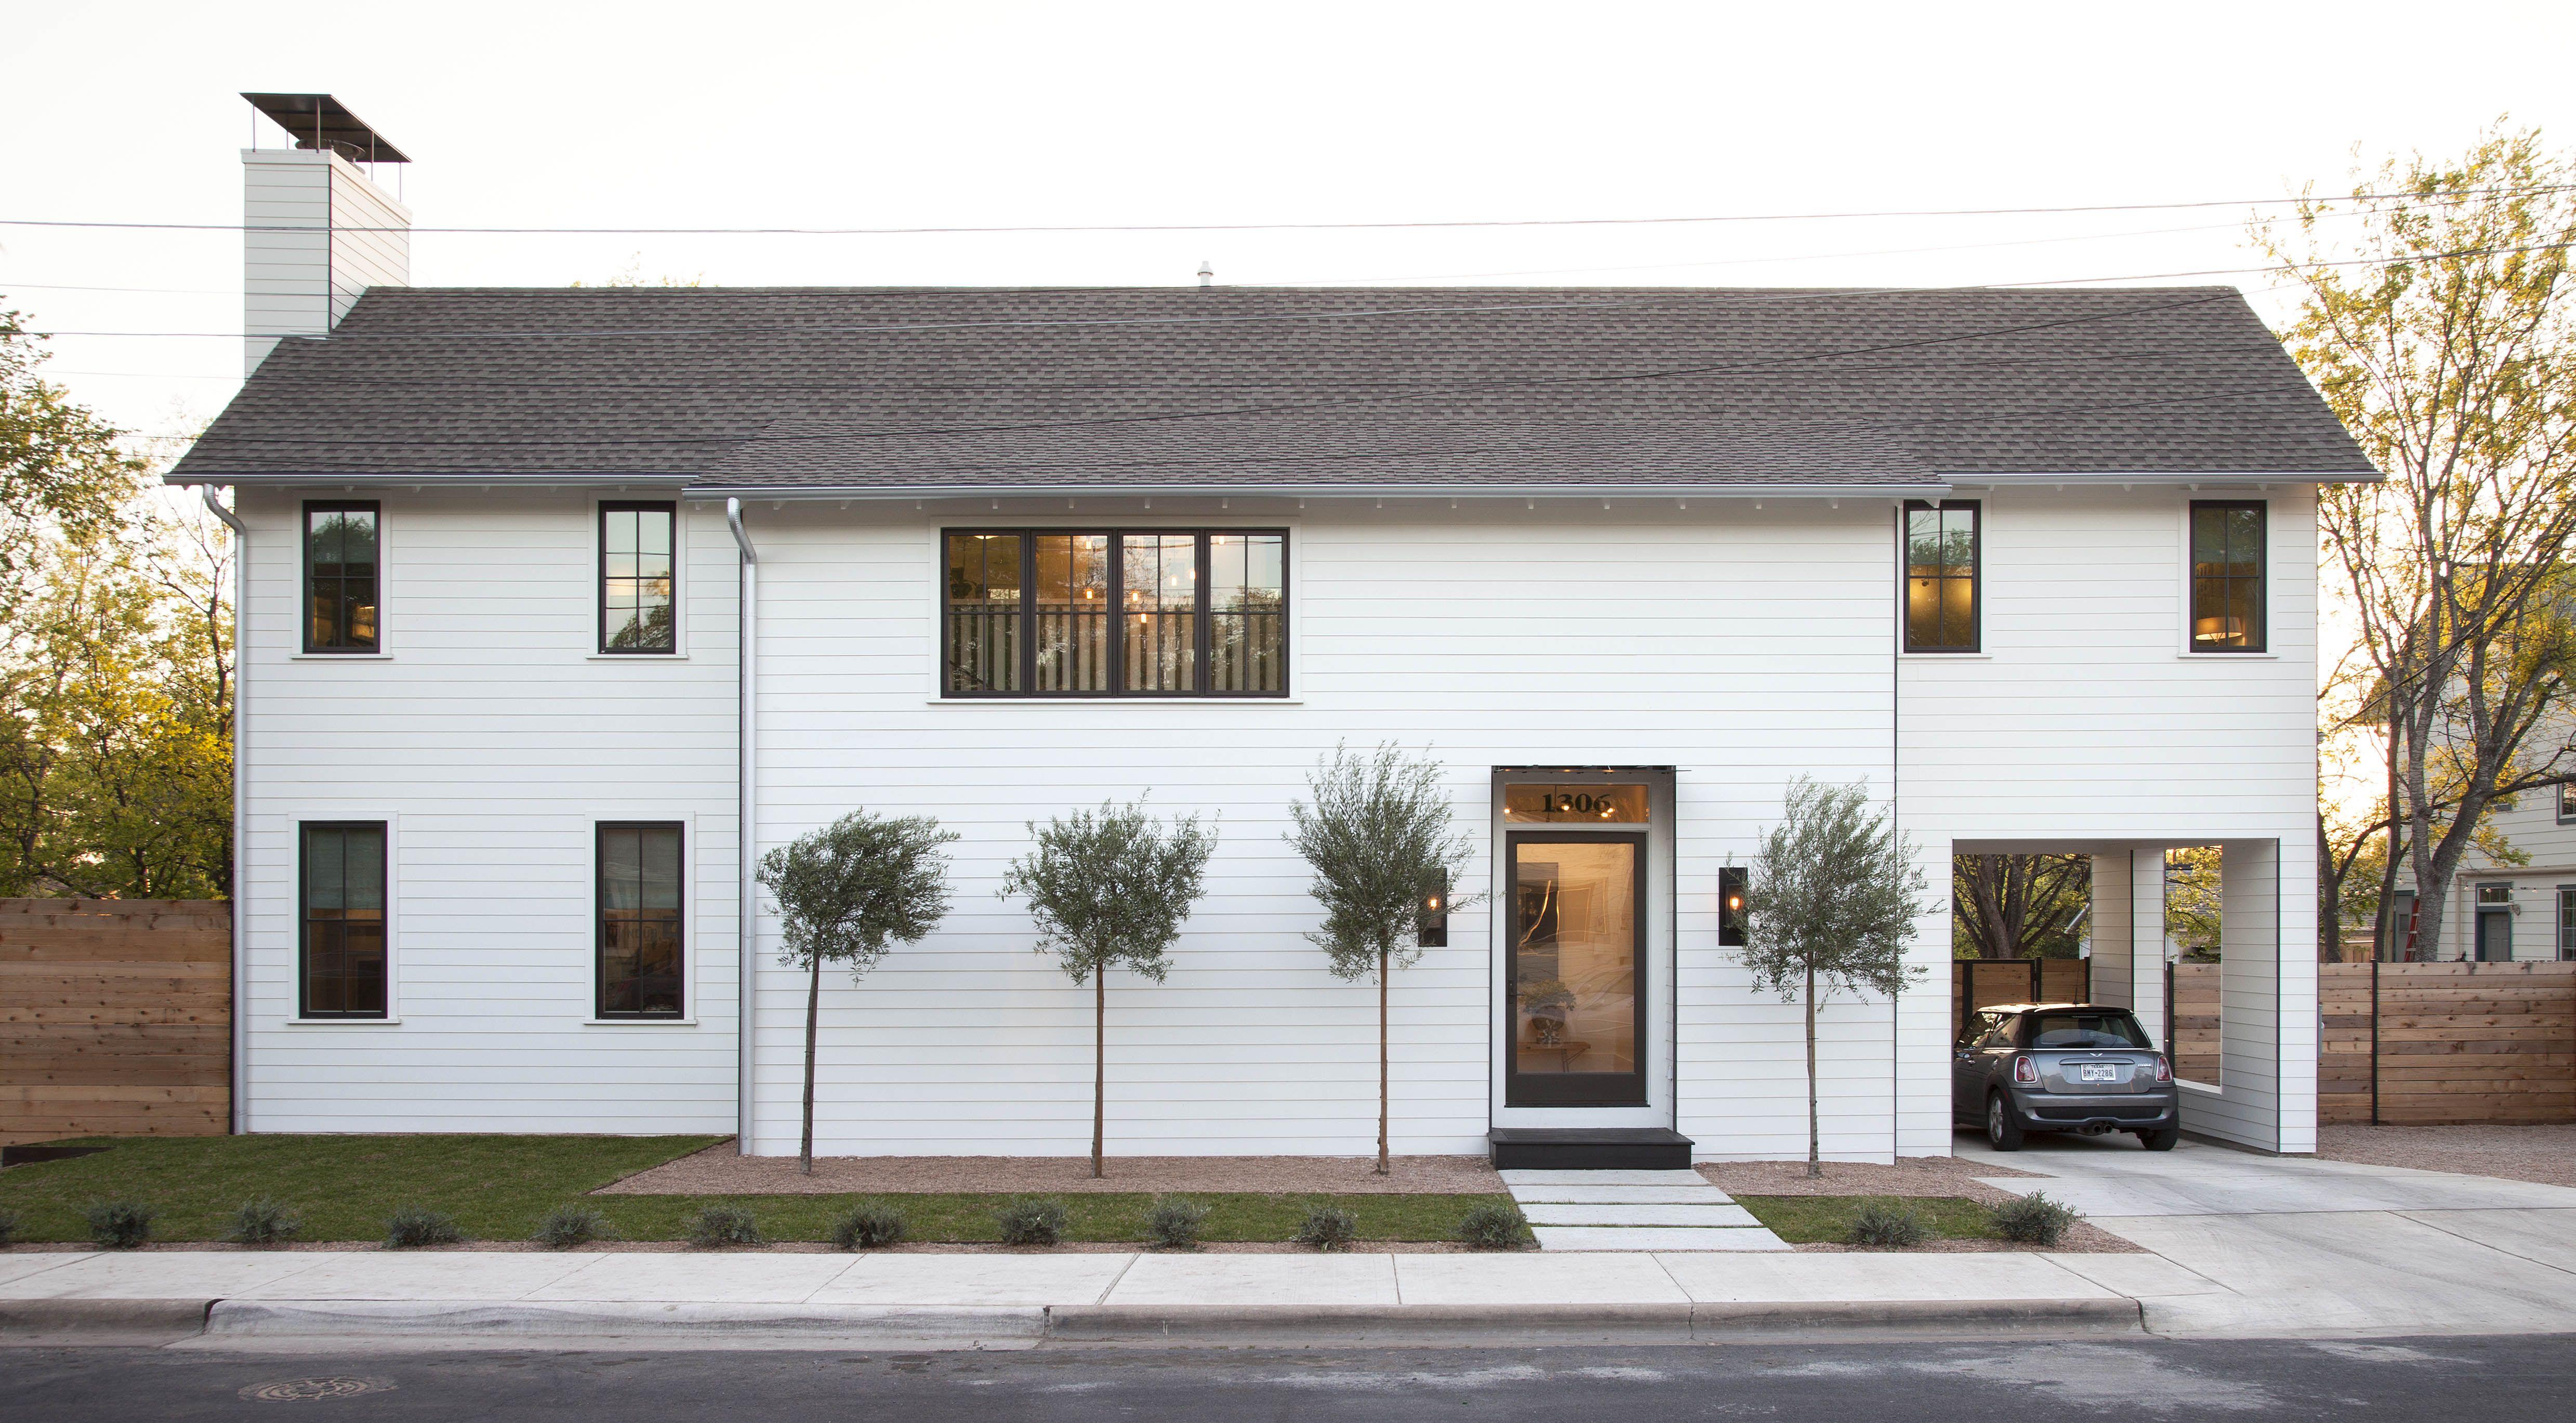 Zed Design Saltbox House Html on